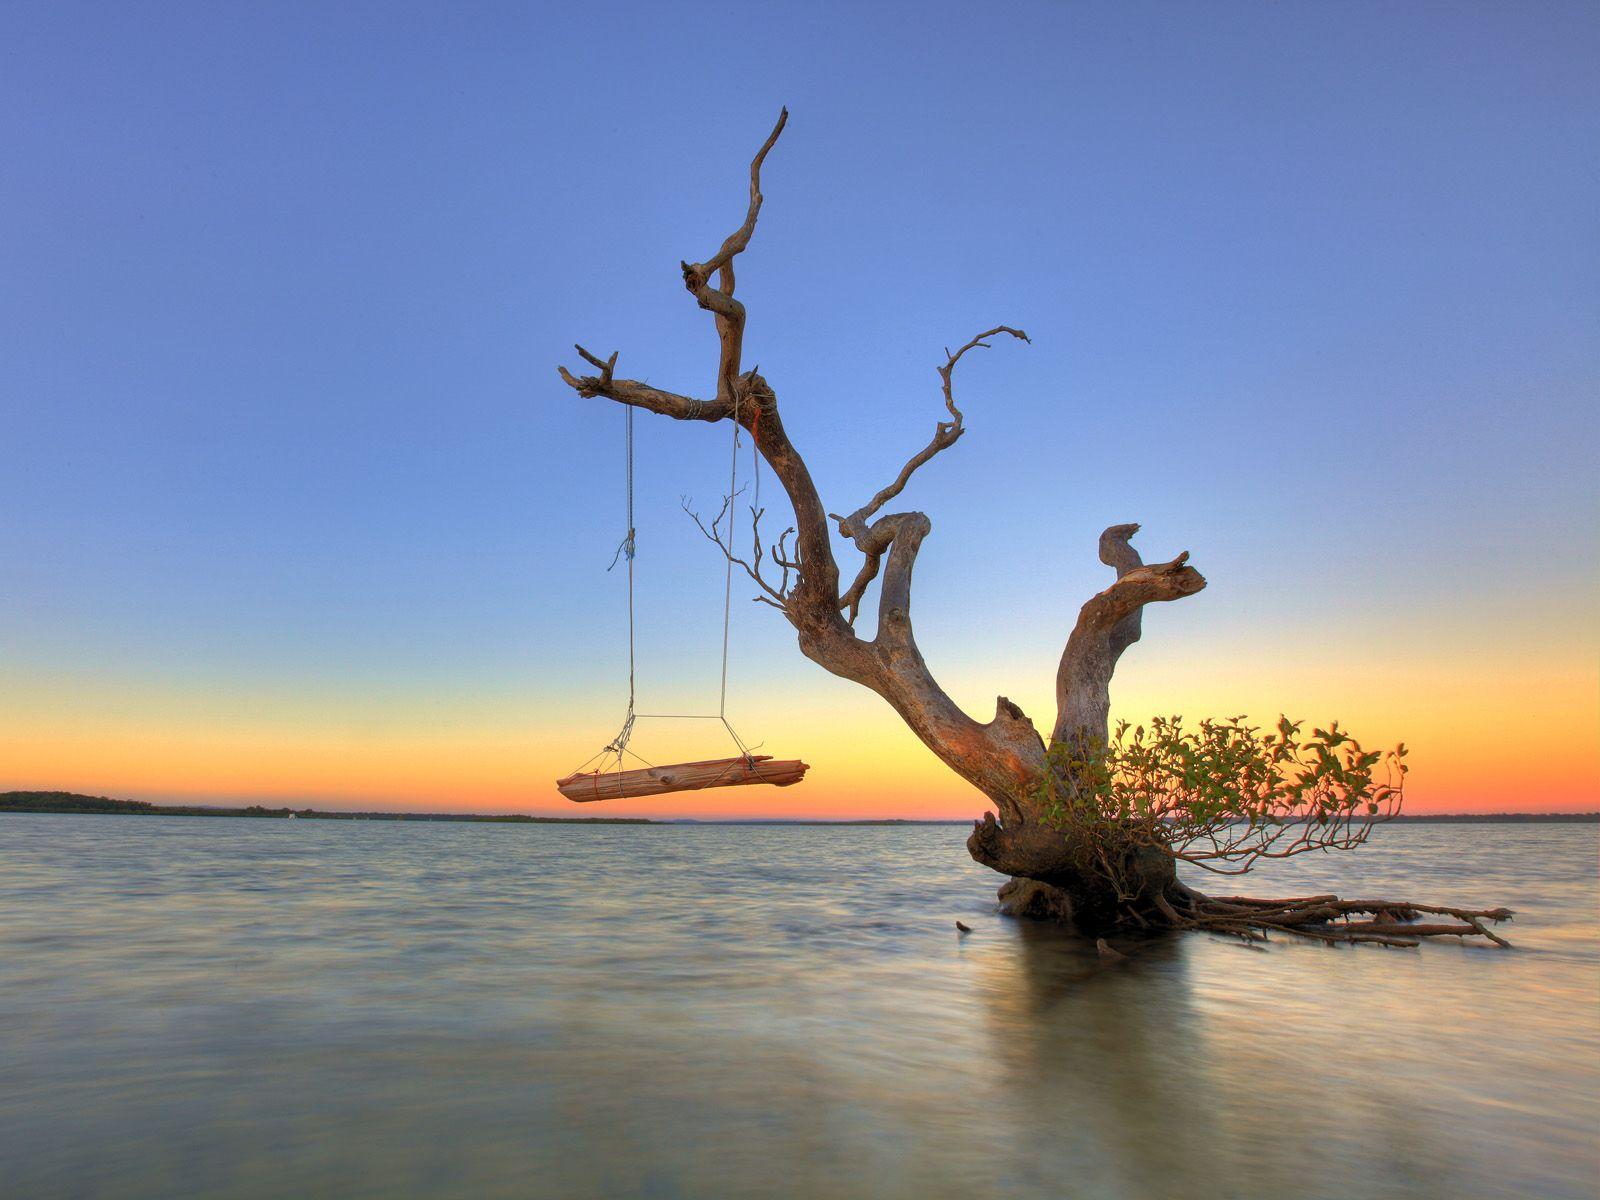 Relaxing at Rainbow Beach, Queensland, Australia